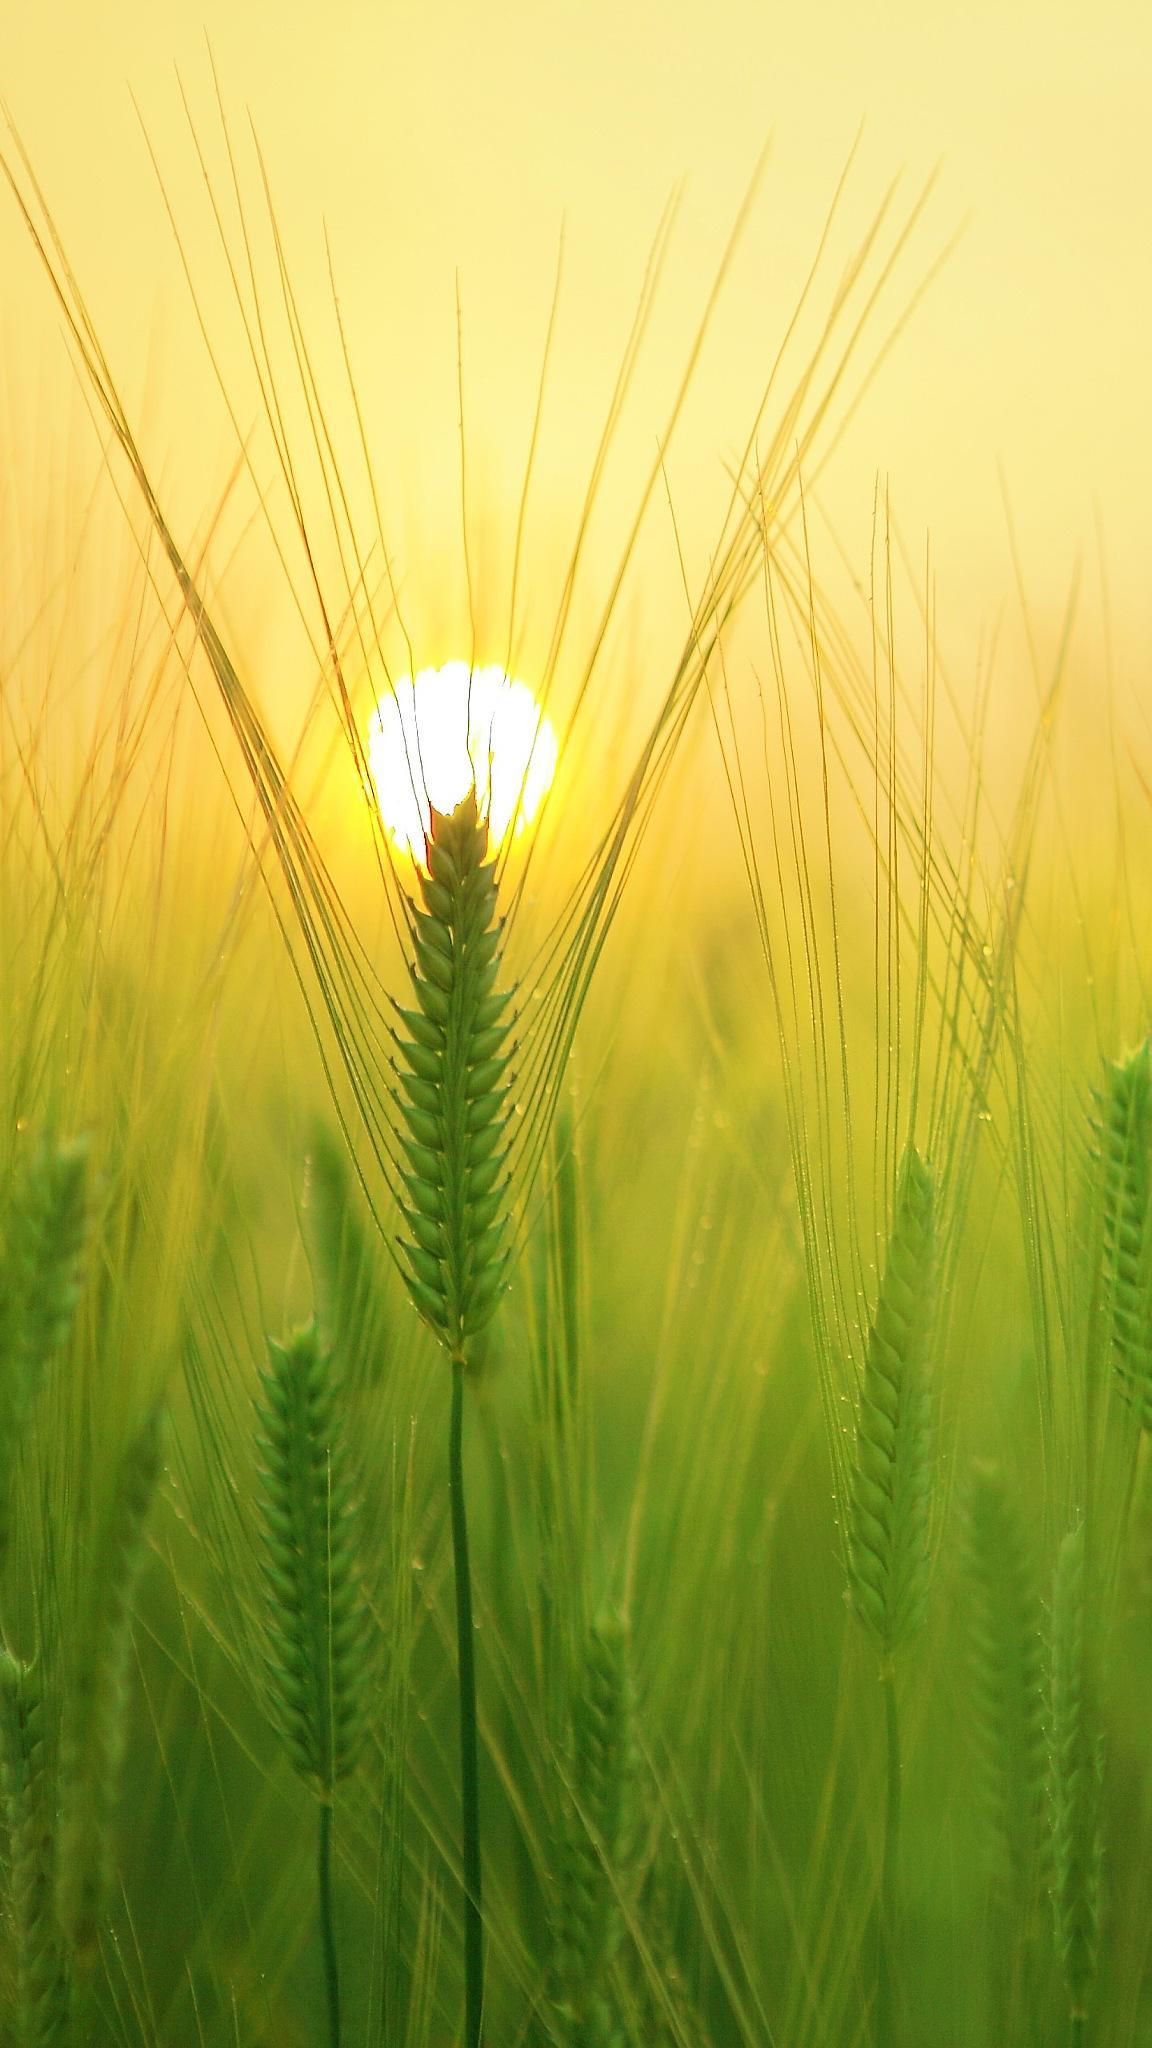 Wheat Field by Vinod Prajapati